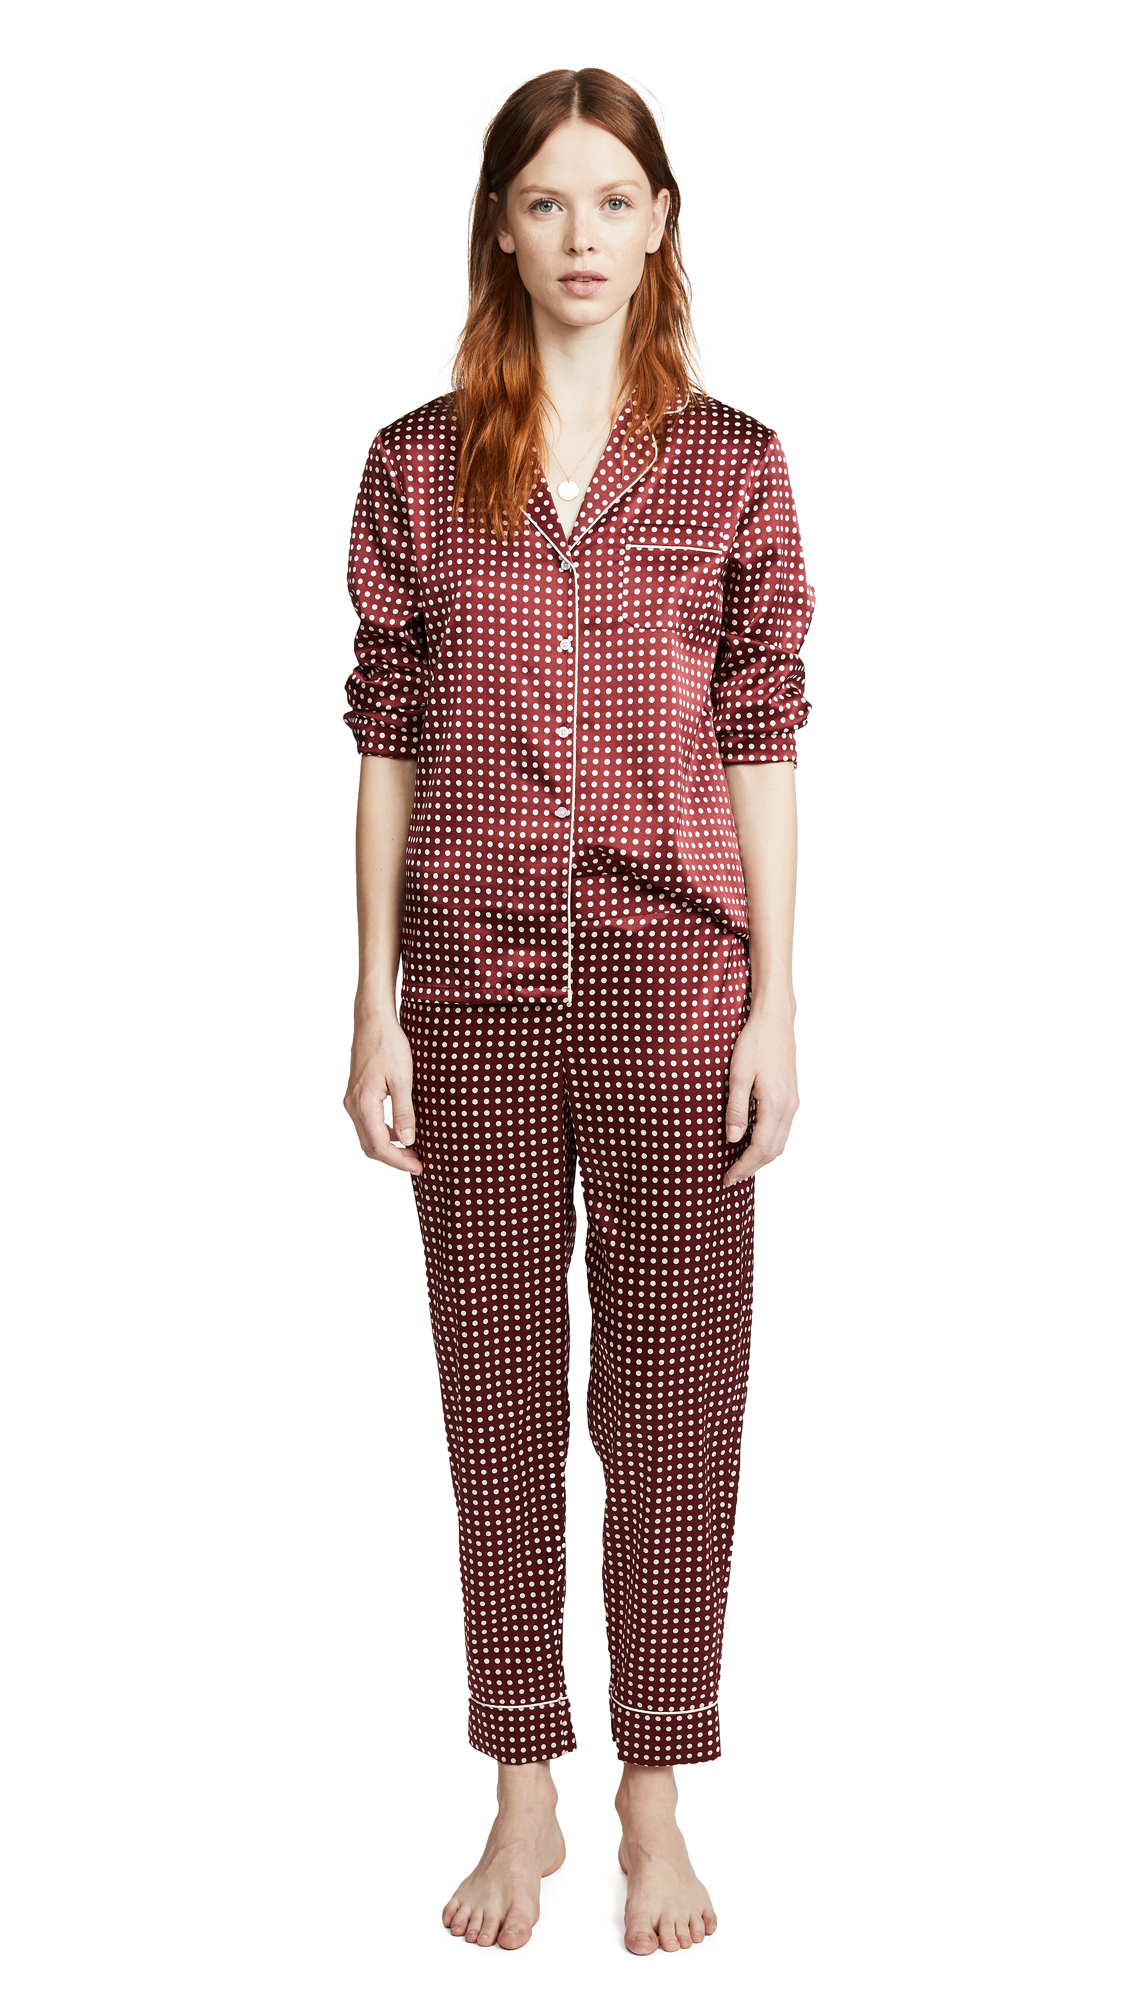 Stella McCartney Poppy Snoozing Long Pajama Set In Red Polka Dot